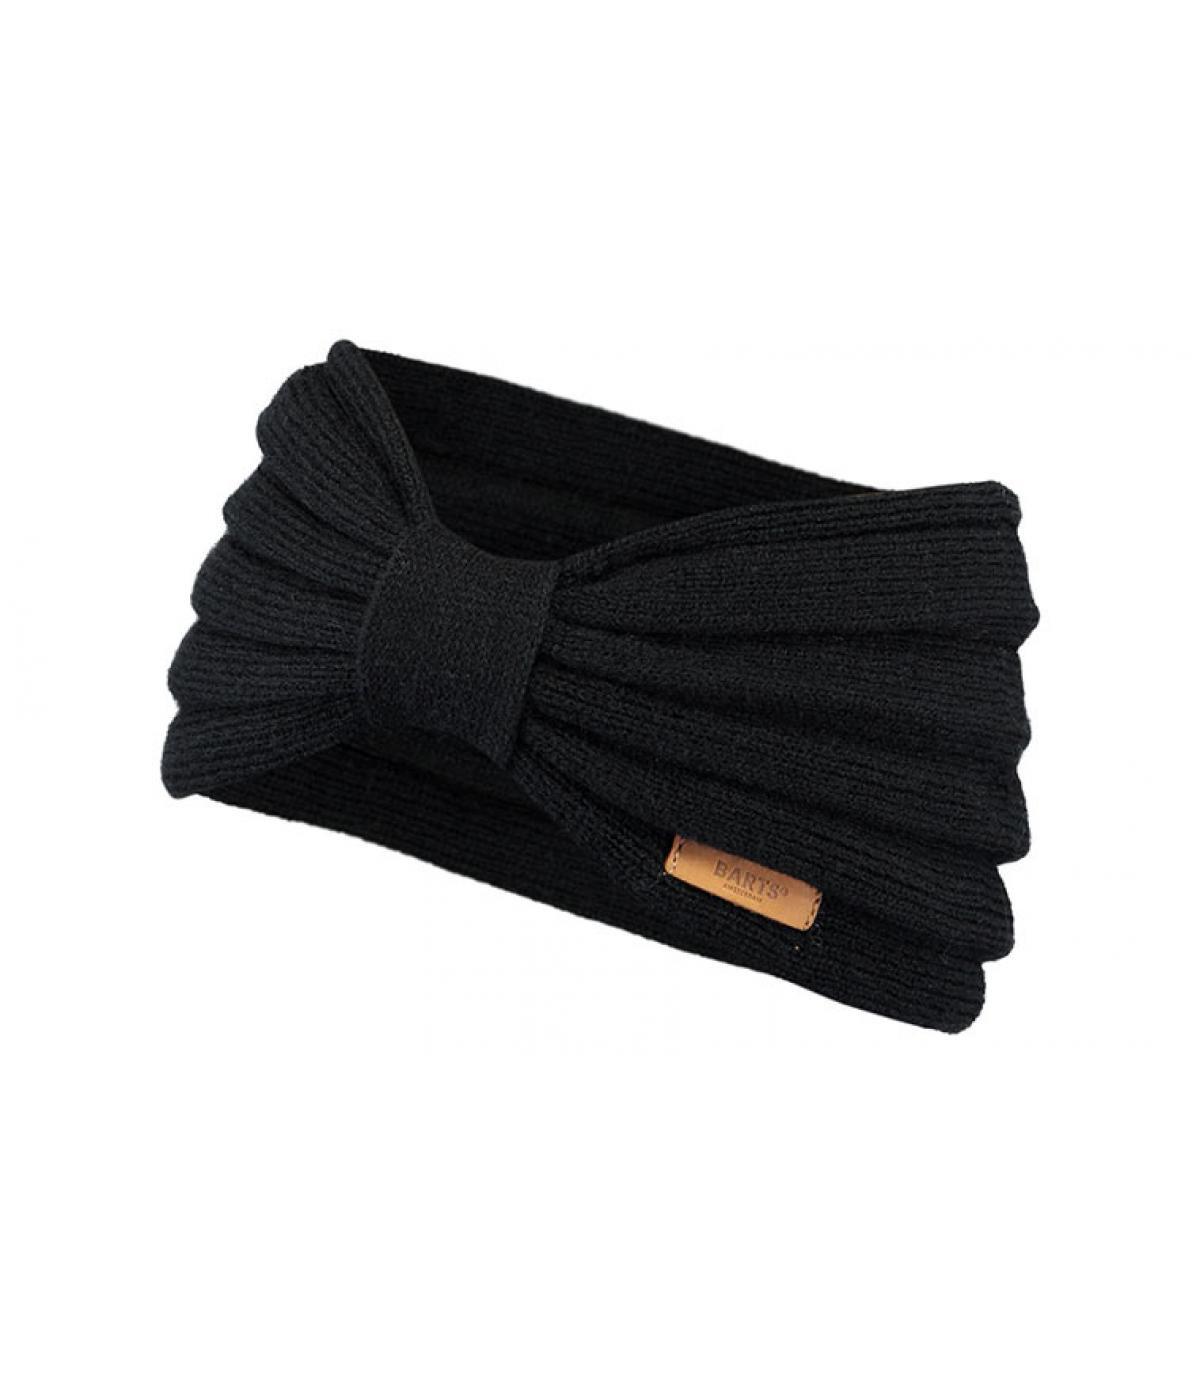 Detalles Zitoun Headband black imagen 2